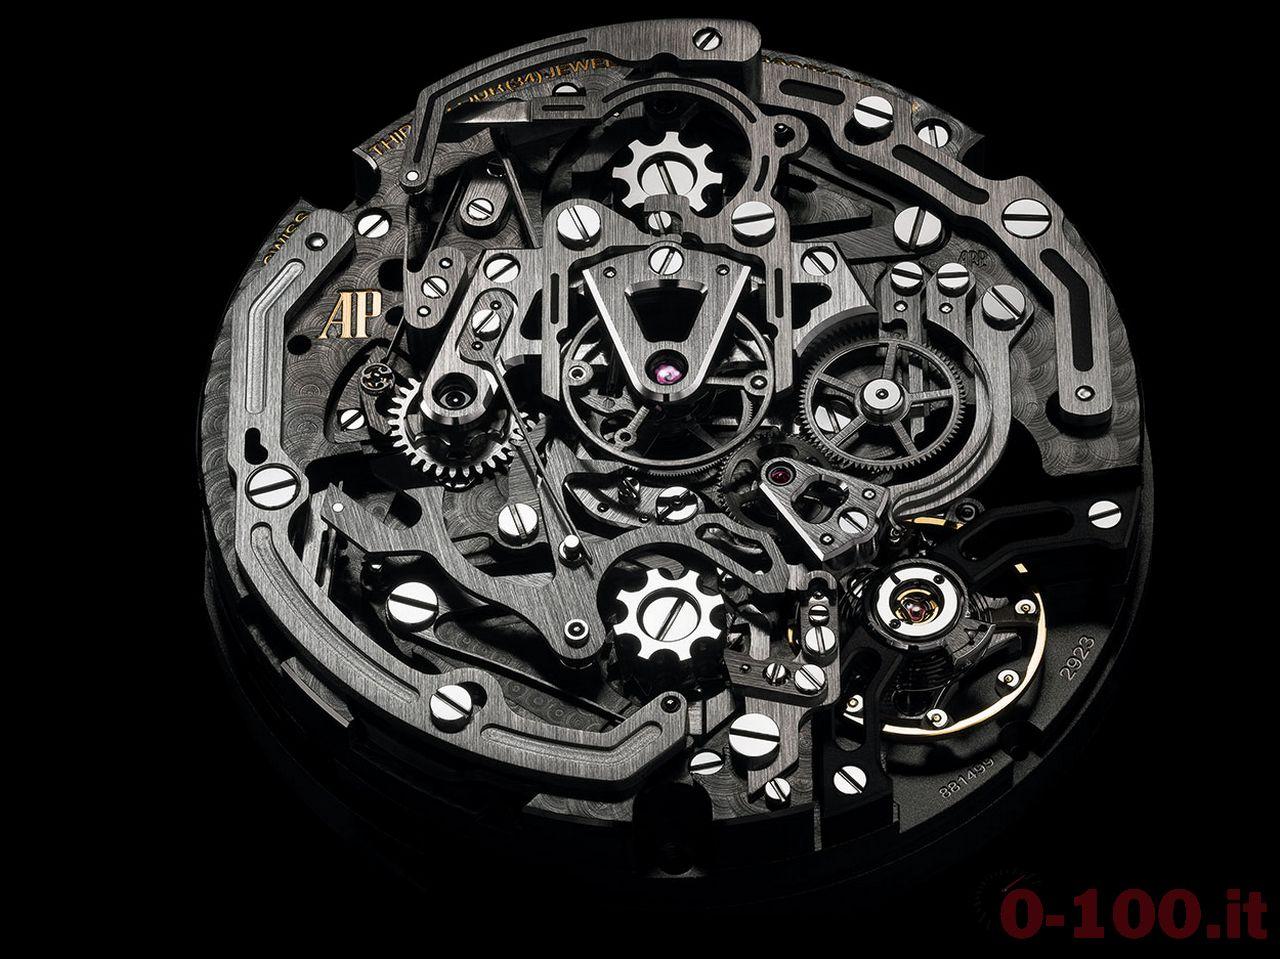 audemars-piguet-royal-oak-concept-laptimer-michael-schumacher-limited-edition-ref-26221ft-oo-d002ca-01_0-10010